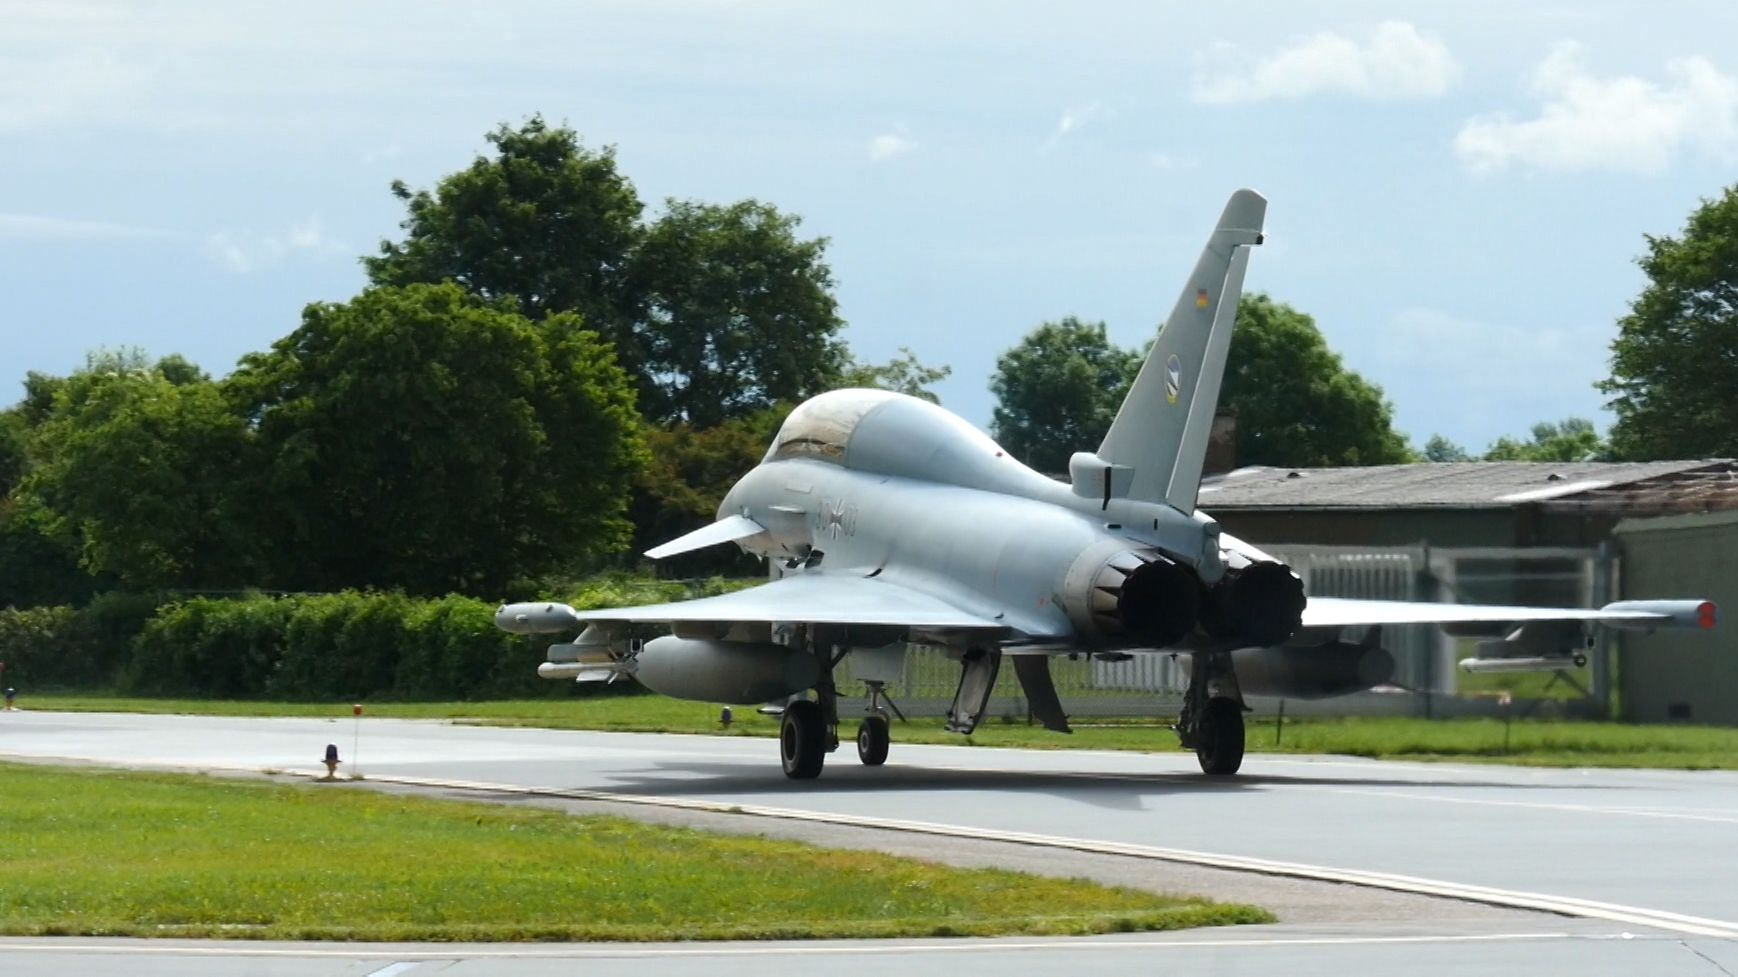 Eurofighter beim Startvorgang